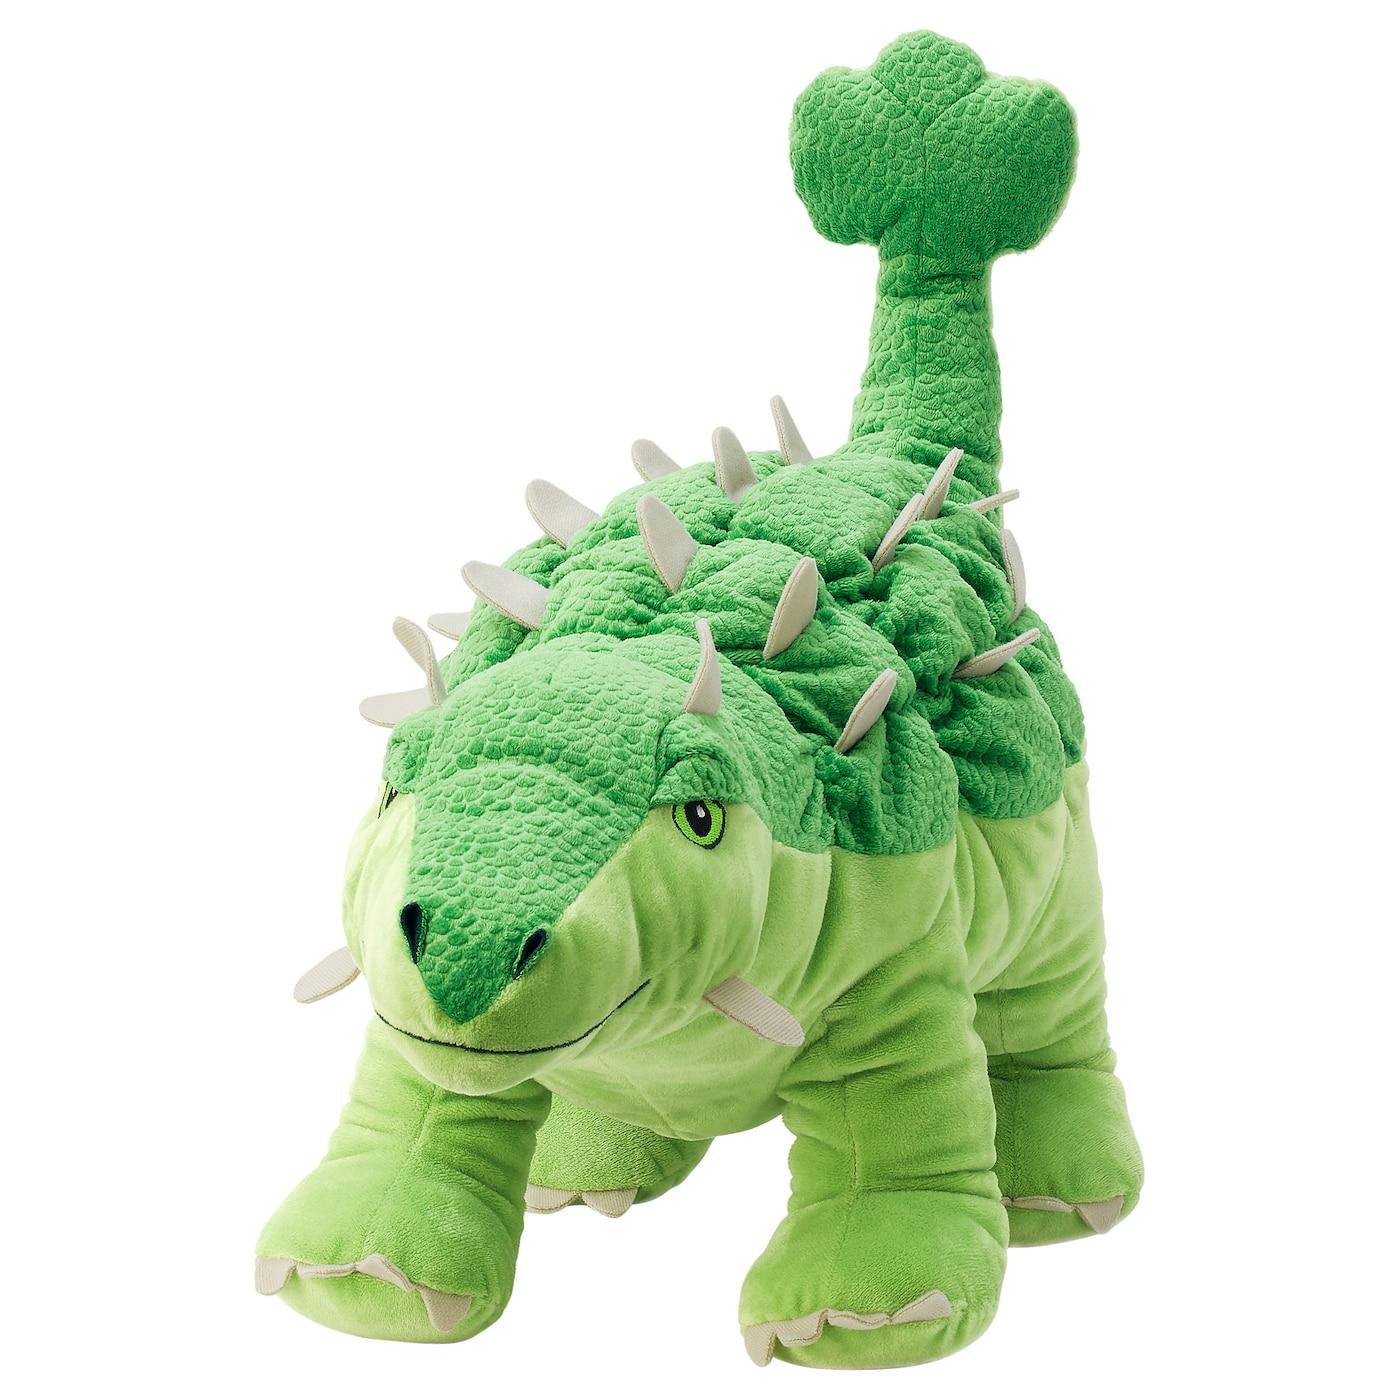 IKEA JÄTTELIK Stofftier Dinosaurier/dinosaurier/ankylosaurus Dinosaurier/Dinosaurier/Ankylosaurus 55 cm   Kinderzimmer > Spielzeuge > Stofftiere   IKEA